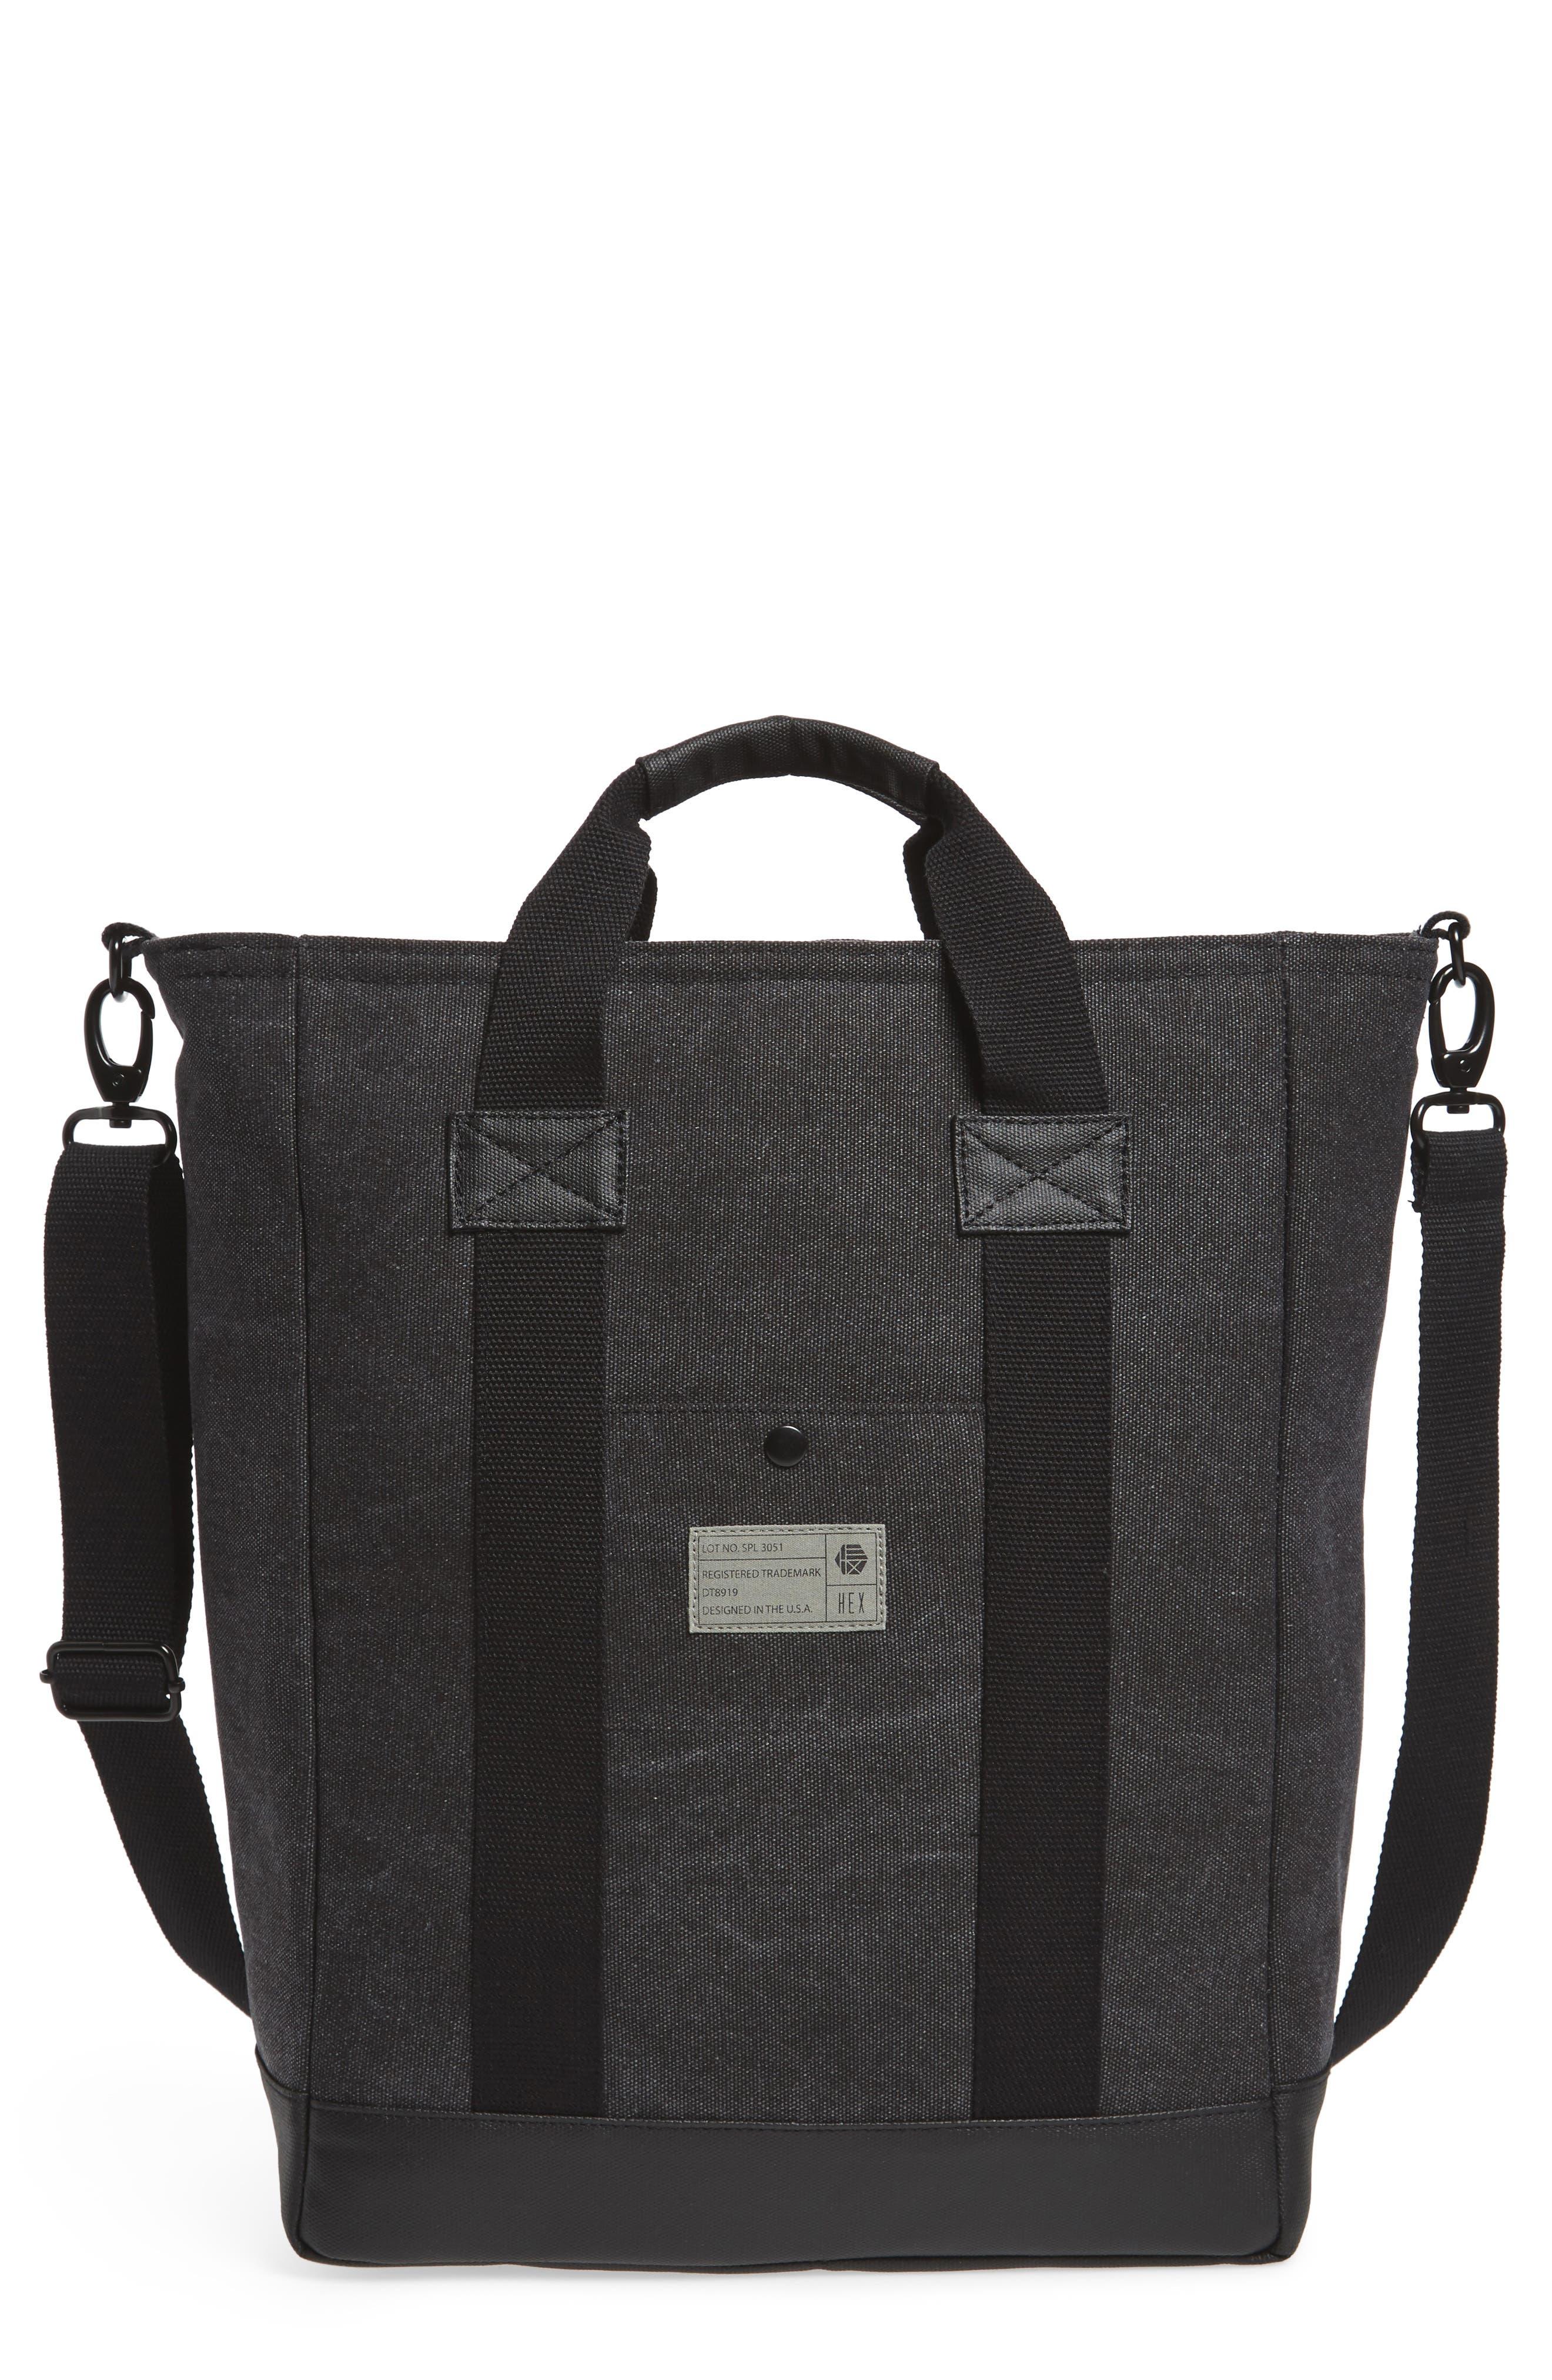 Main Image - HEX Canvas Tote Bag